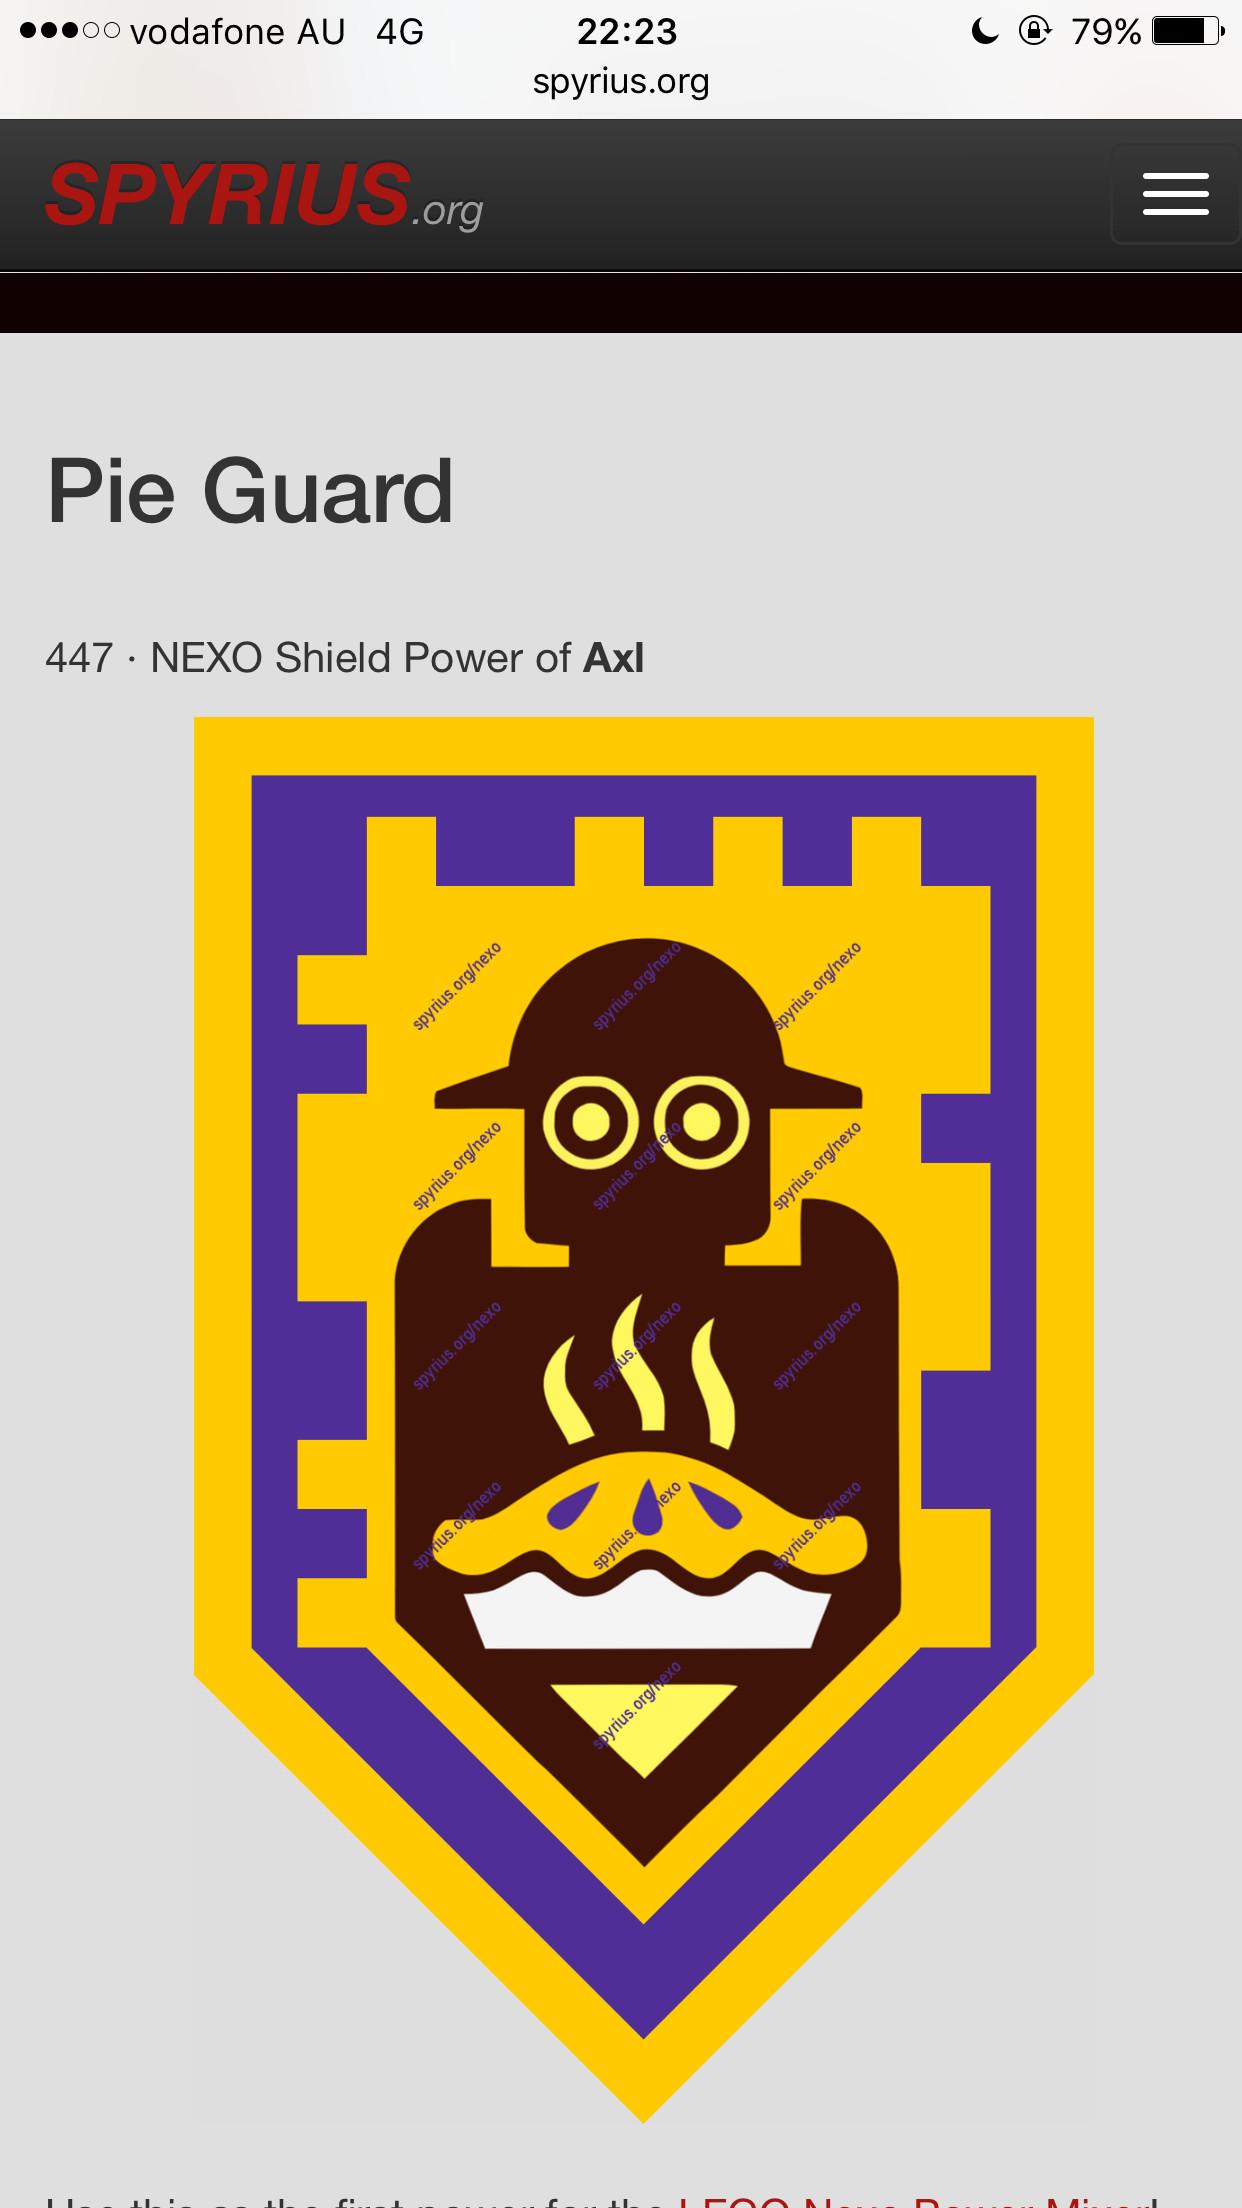 Nexo Knights Schilder Liste Einzigartig Pin Od Aga Zalewska Na Nexo Tarcze Pinterest Sammlung